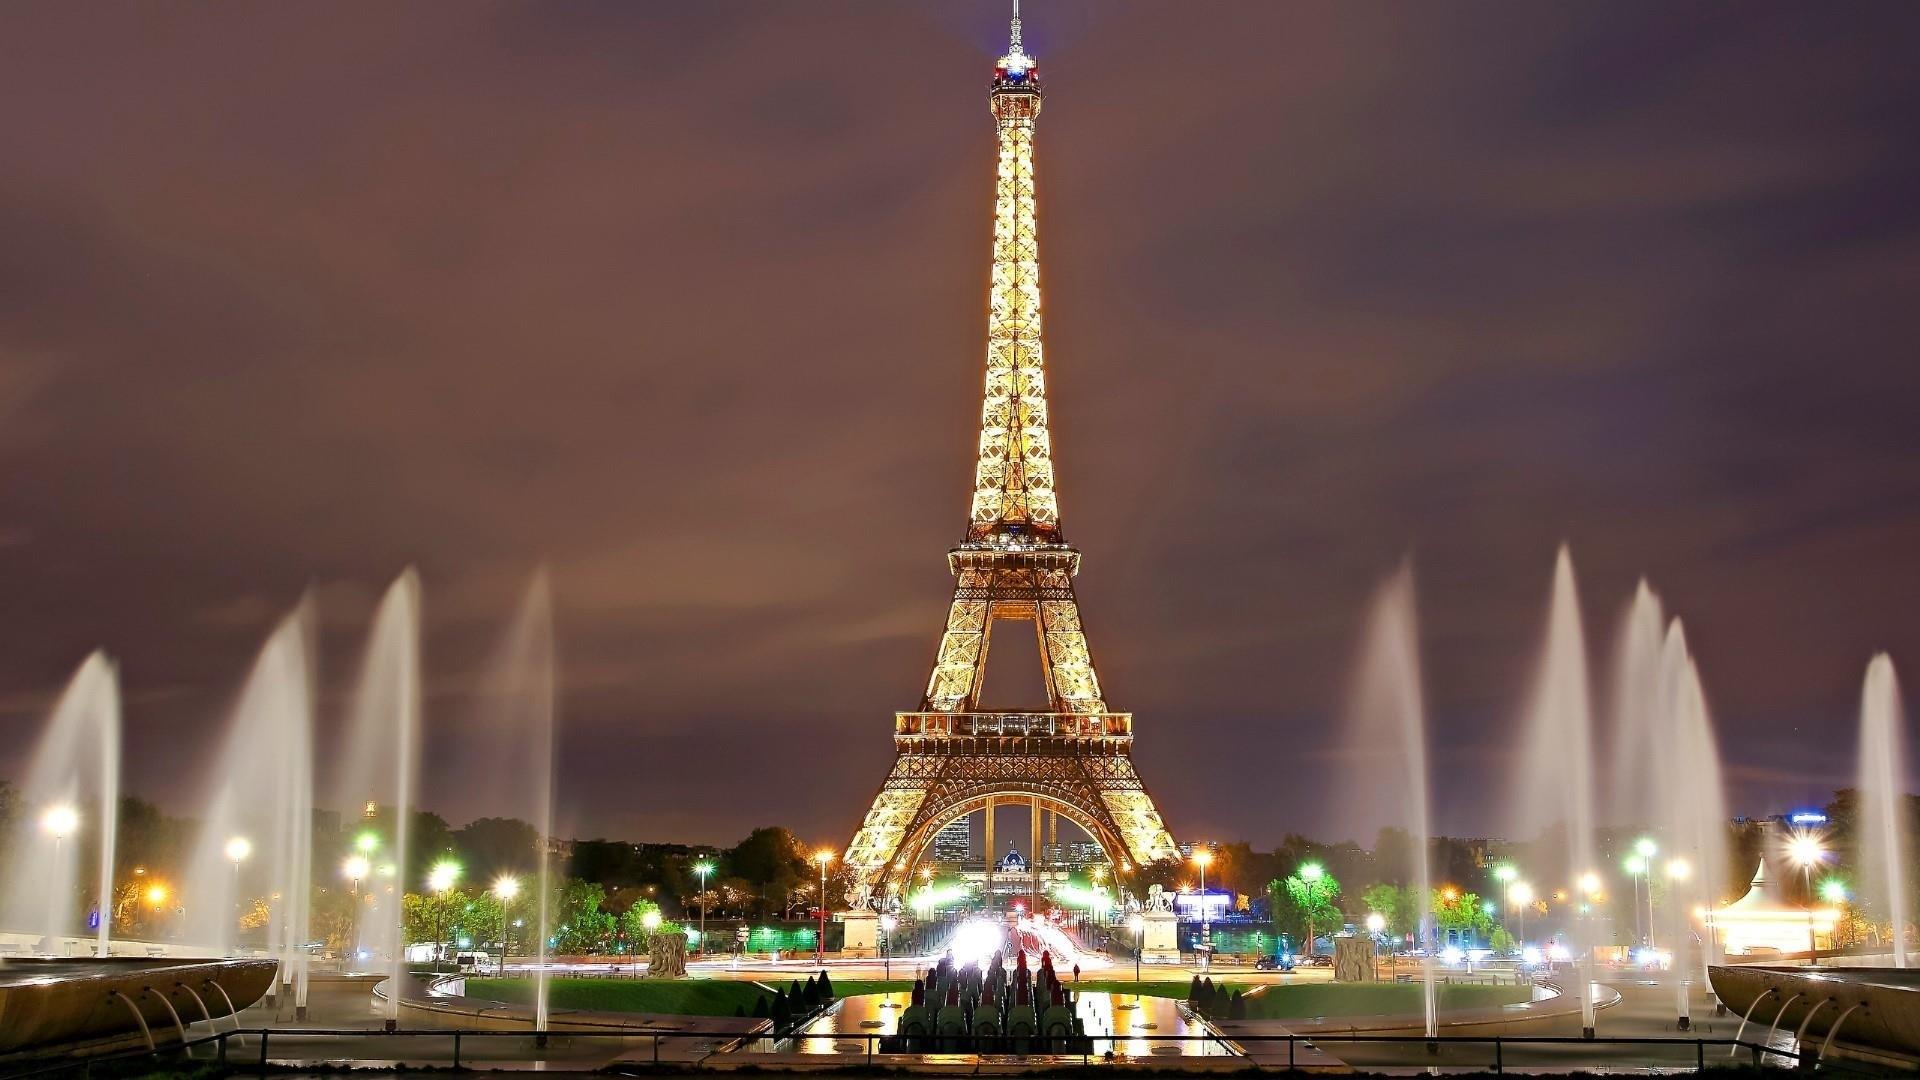 Eiffel Tower PC Wallpaper